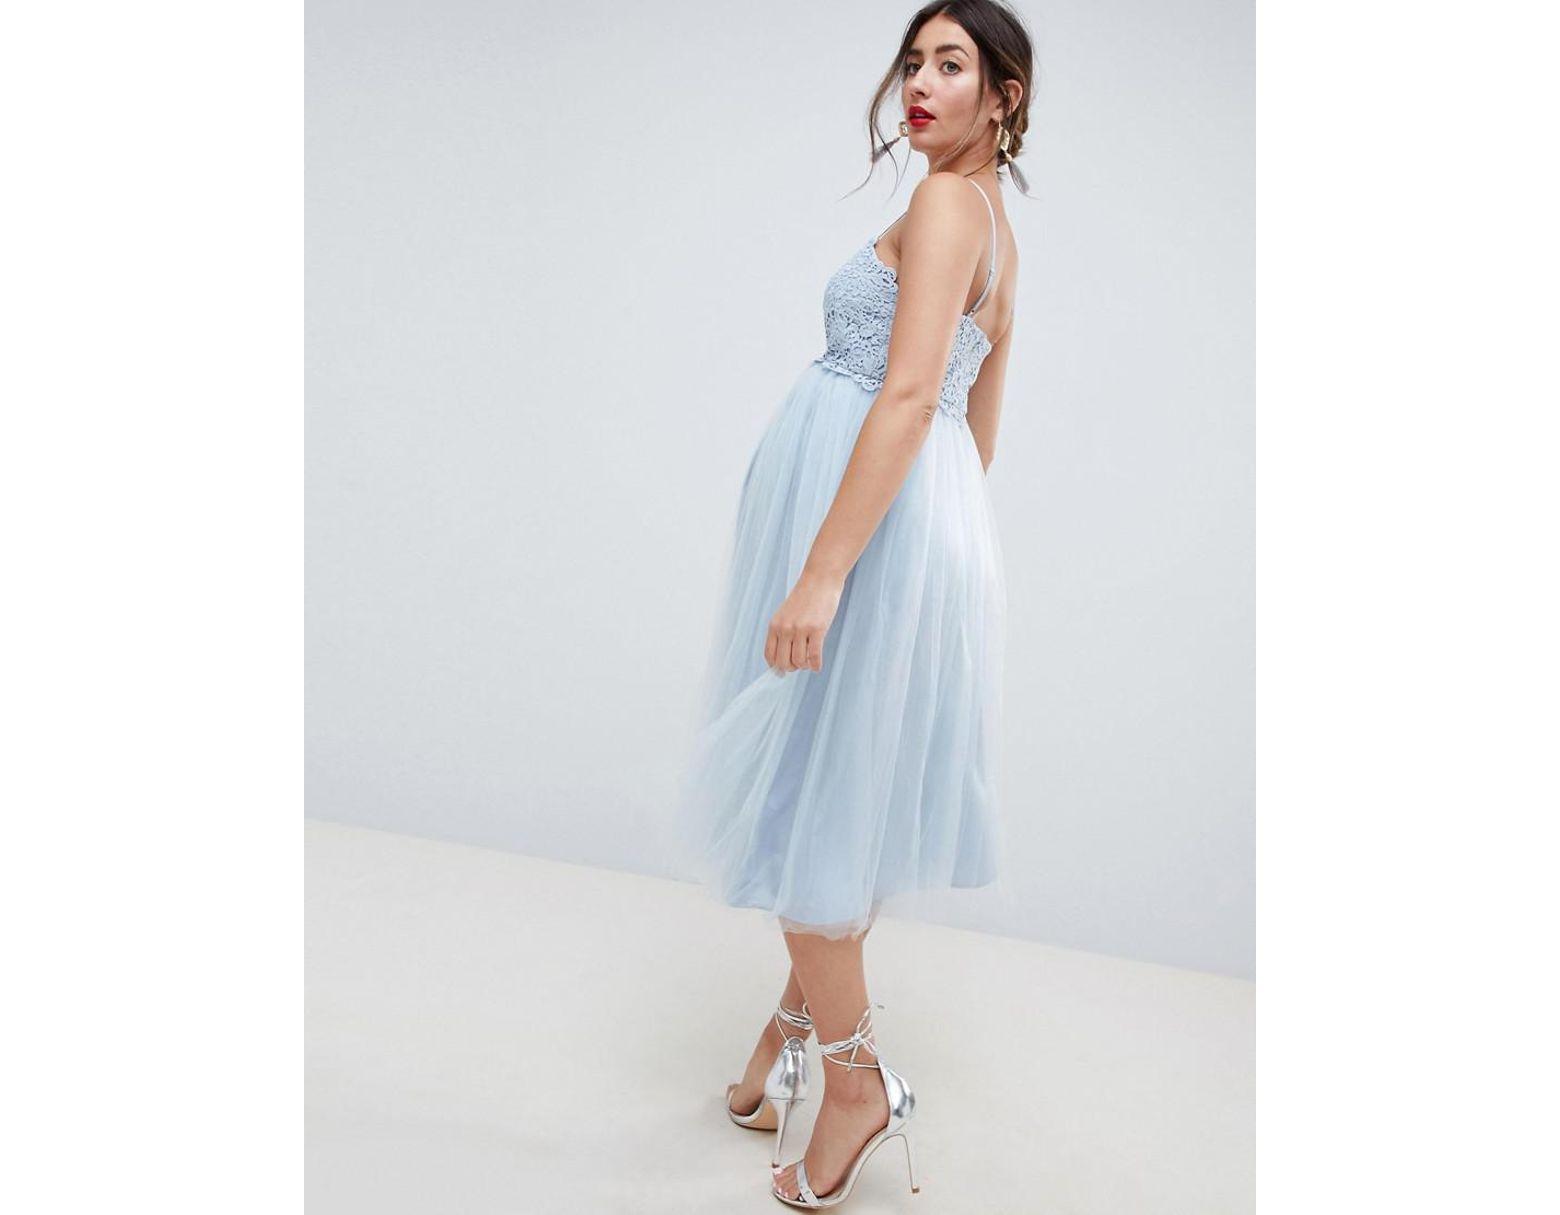 876f12acf29b ASOS Asos Design Maternity Premium Lace Cami Top Tulle Midi Dress in Blue -  Lyst